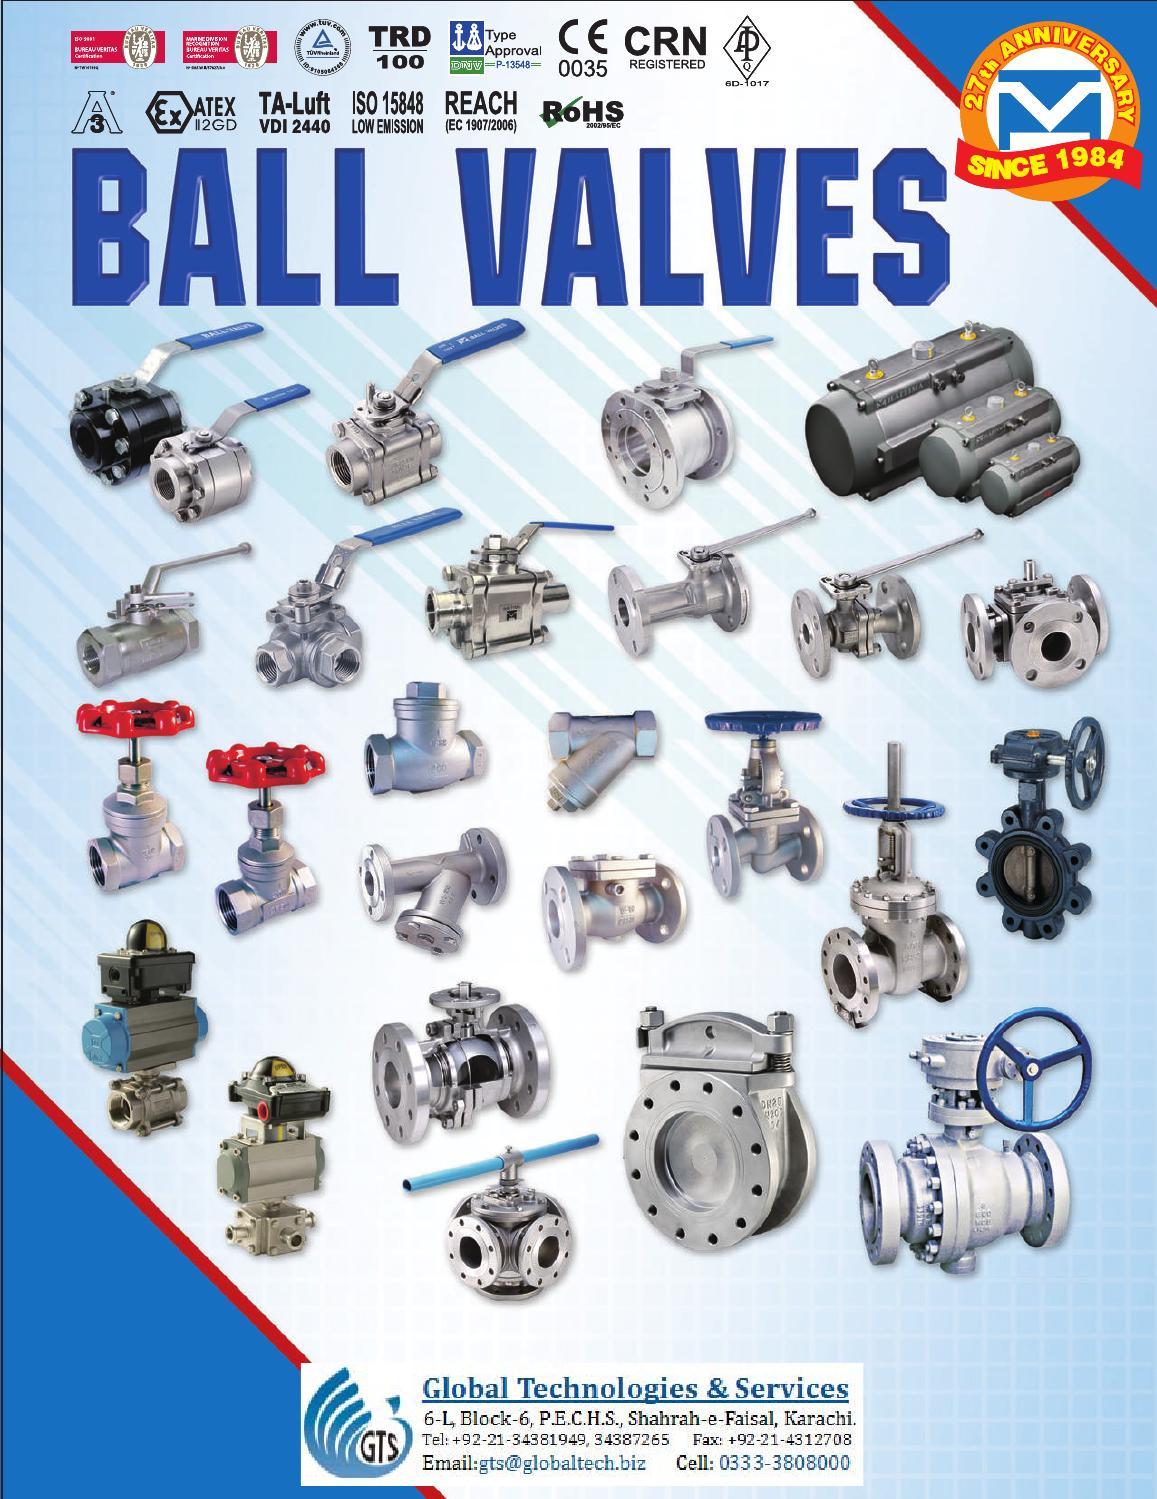 "25 1/"" 316 stainless steel bearing balls 3-3//4 lbs"